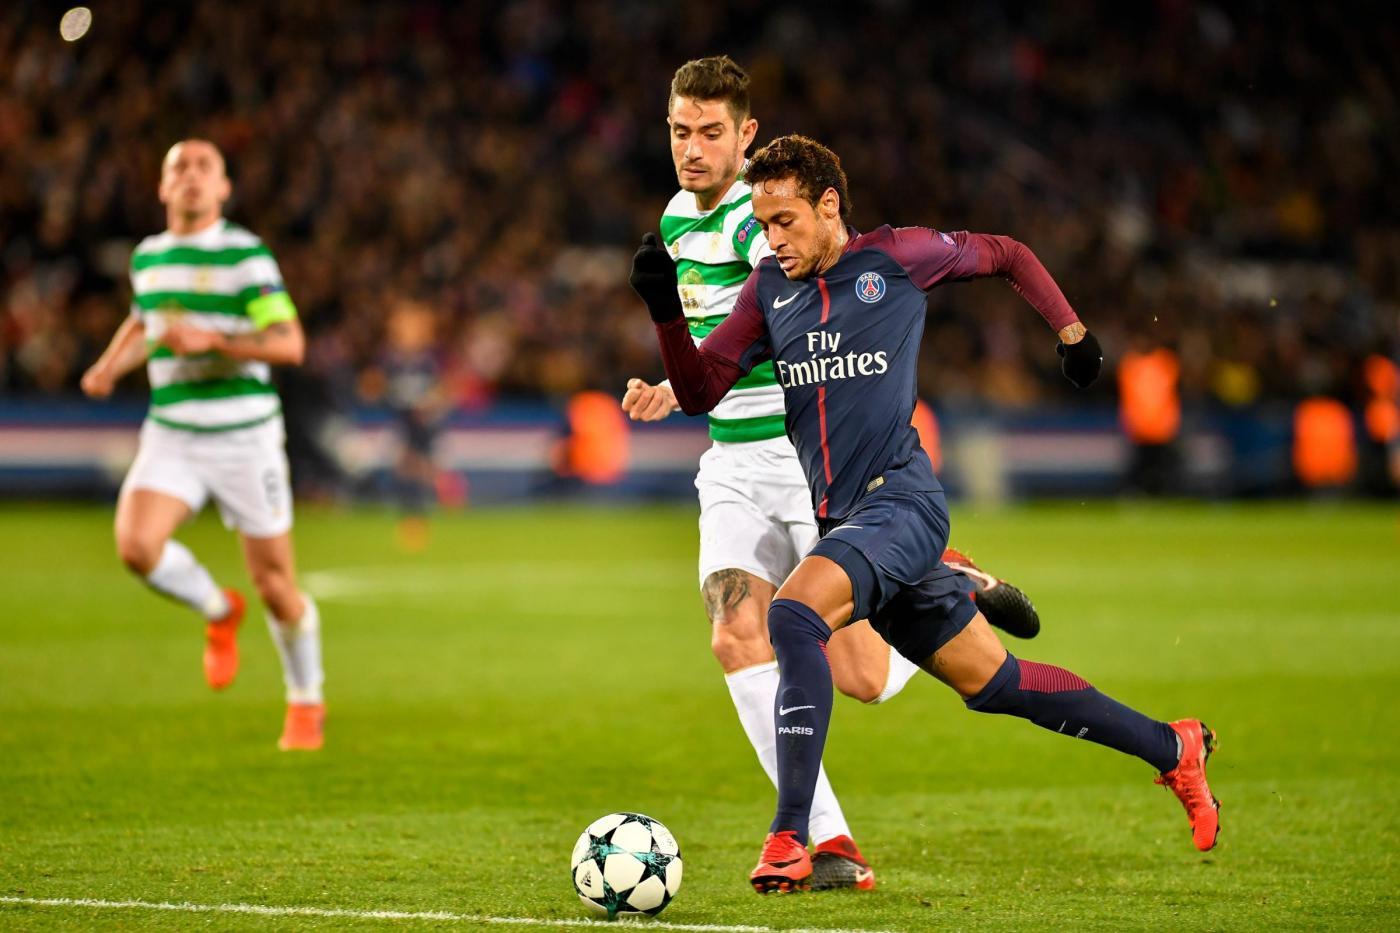 PSG-Guingamp 24 gennaio, analisi e pronostico Coupe de France